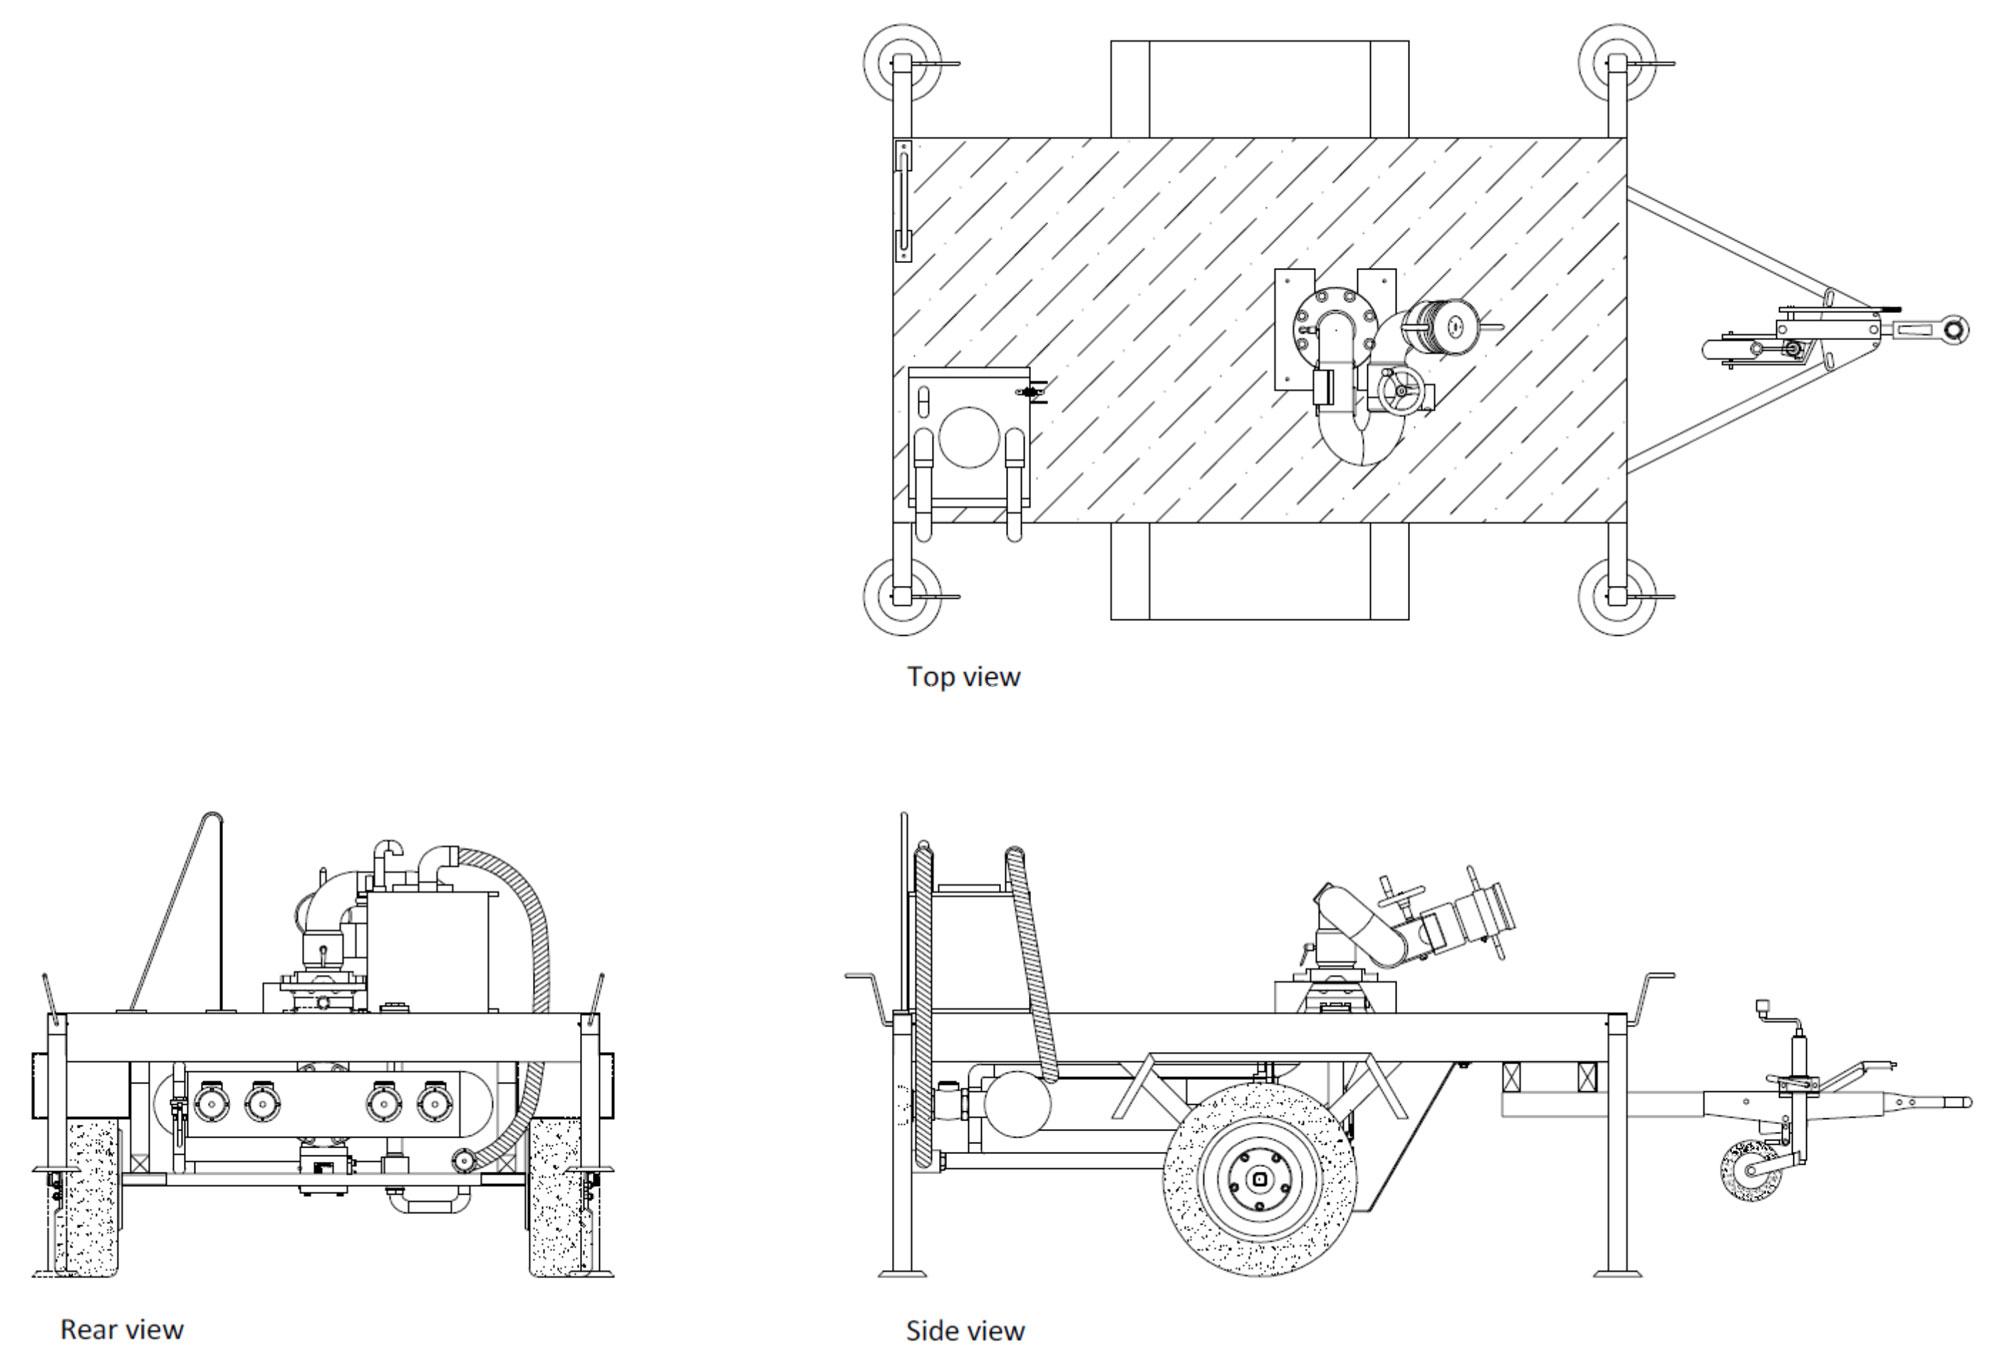 Technische specificatie trailer Blusmonitor type 2